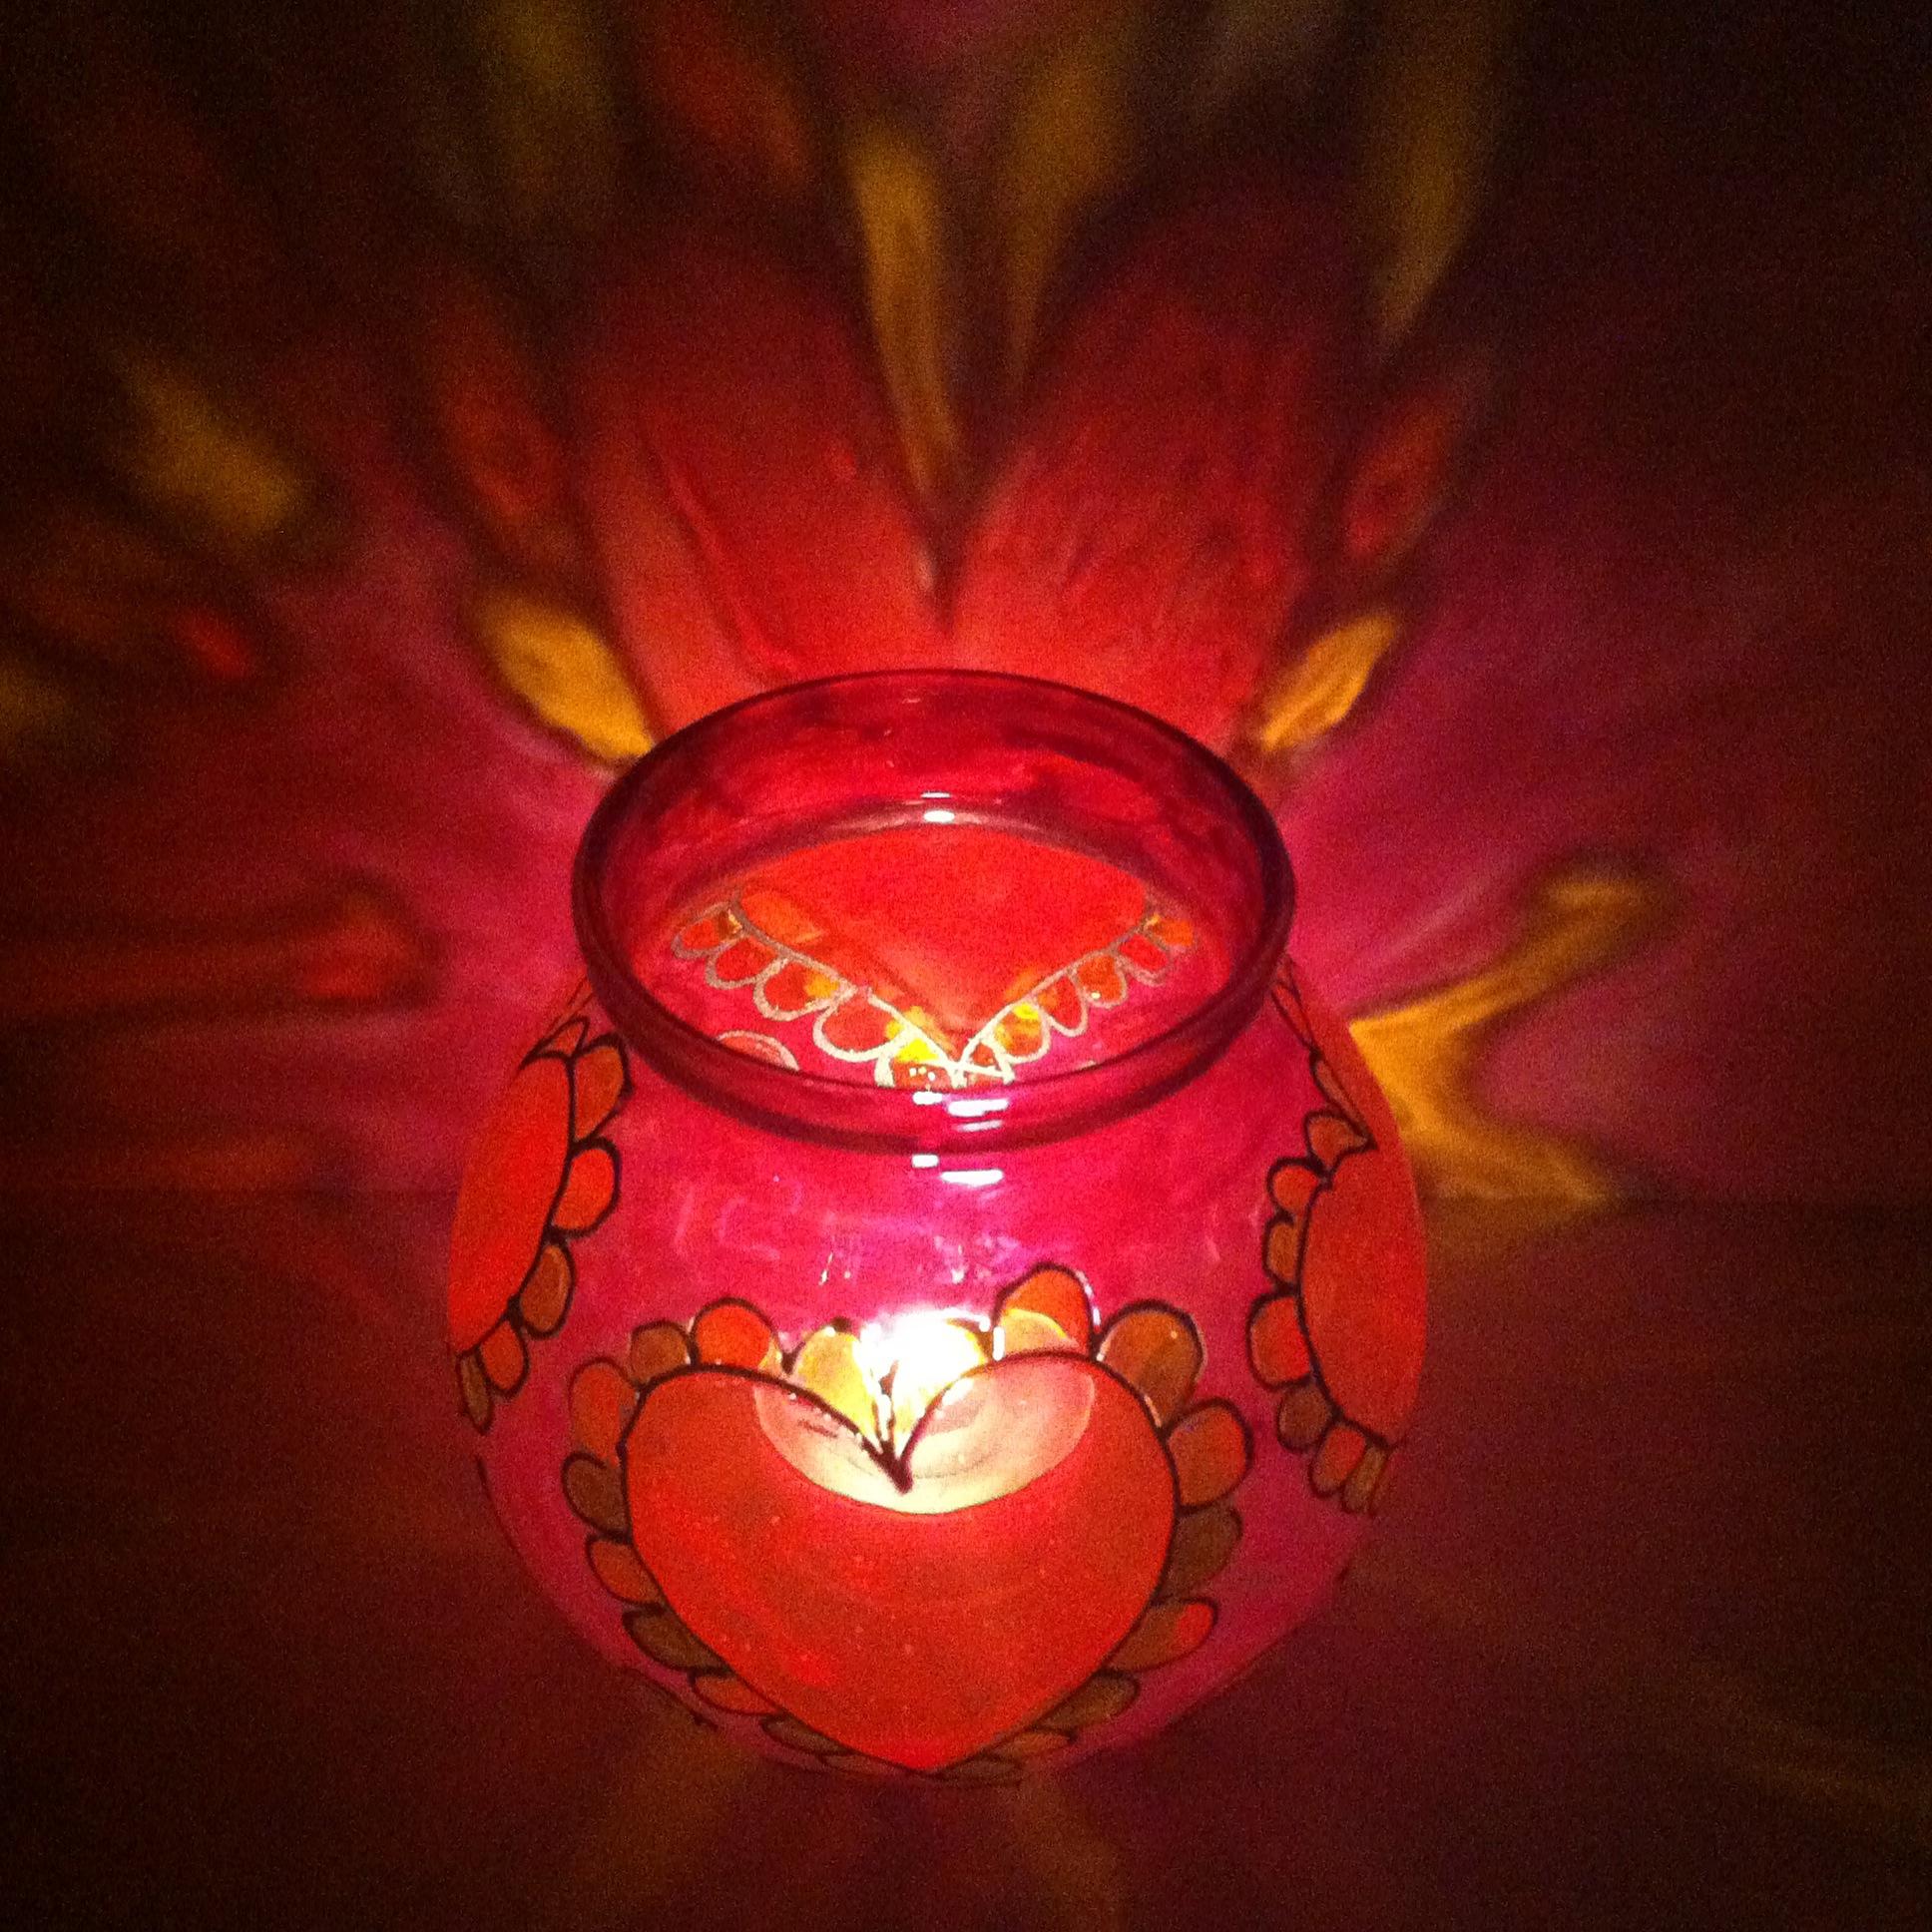 heart candle lit.jpg